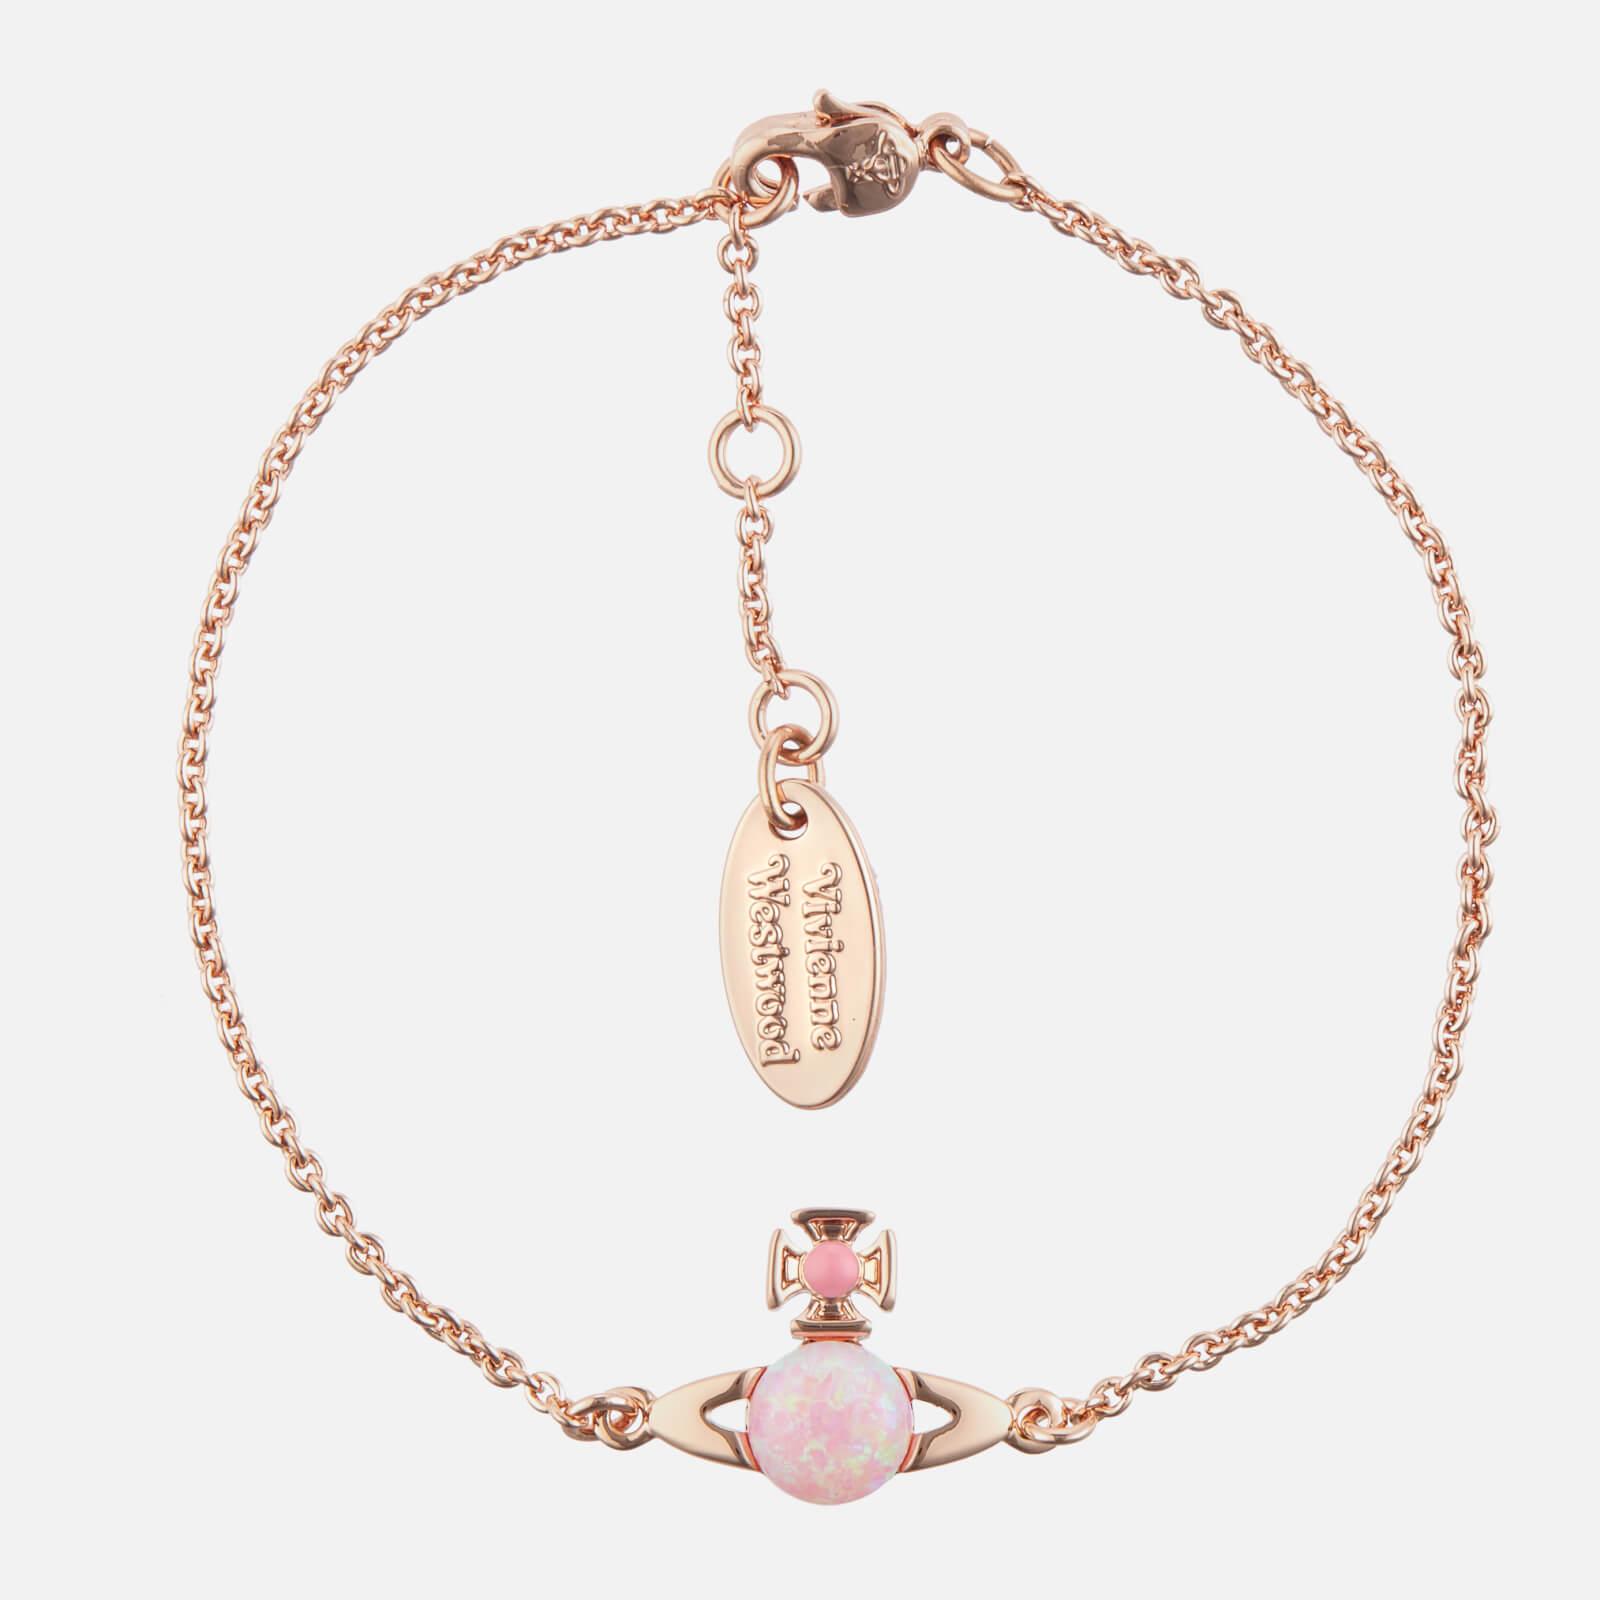 Vivienne Westwood Women's Isabelitta Bas Relief Bracelet - Pink Gold Pink Pink